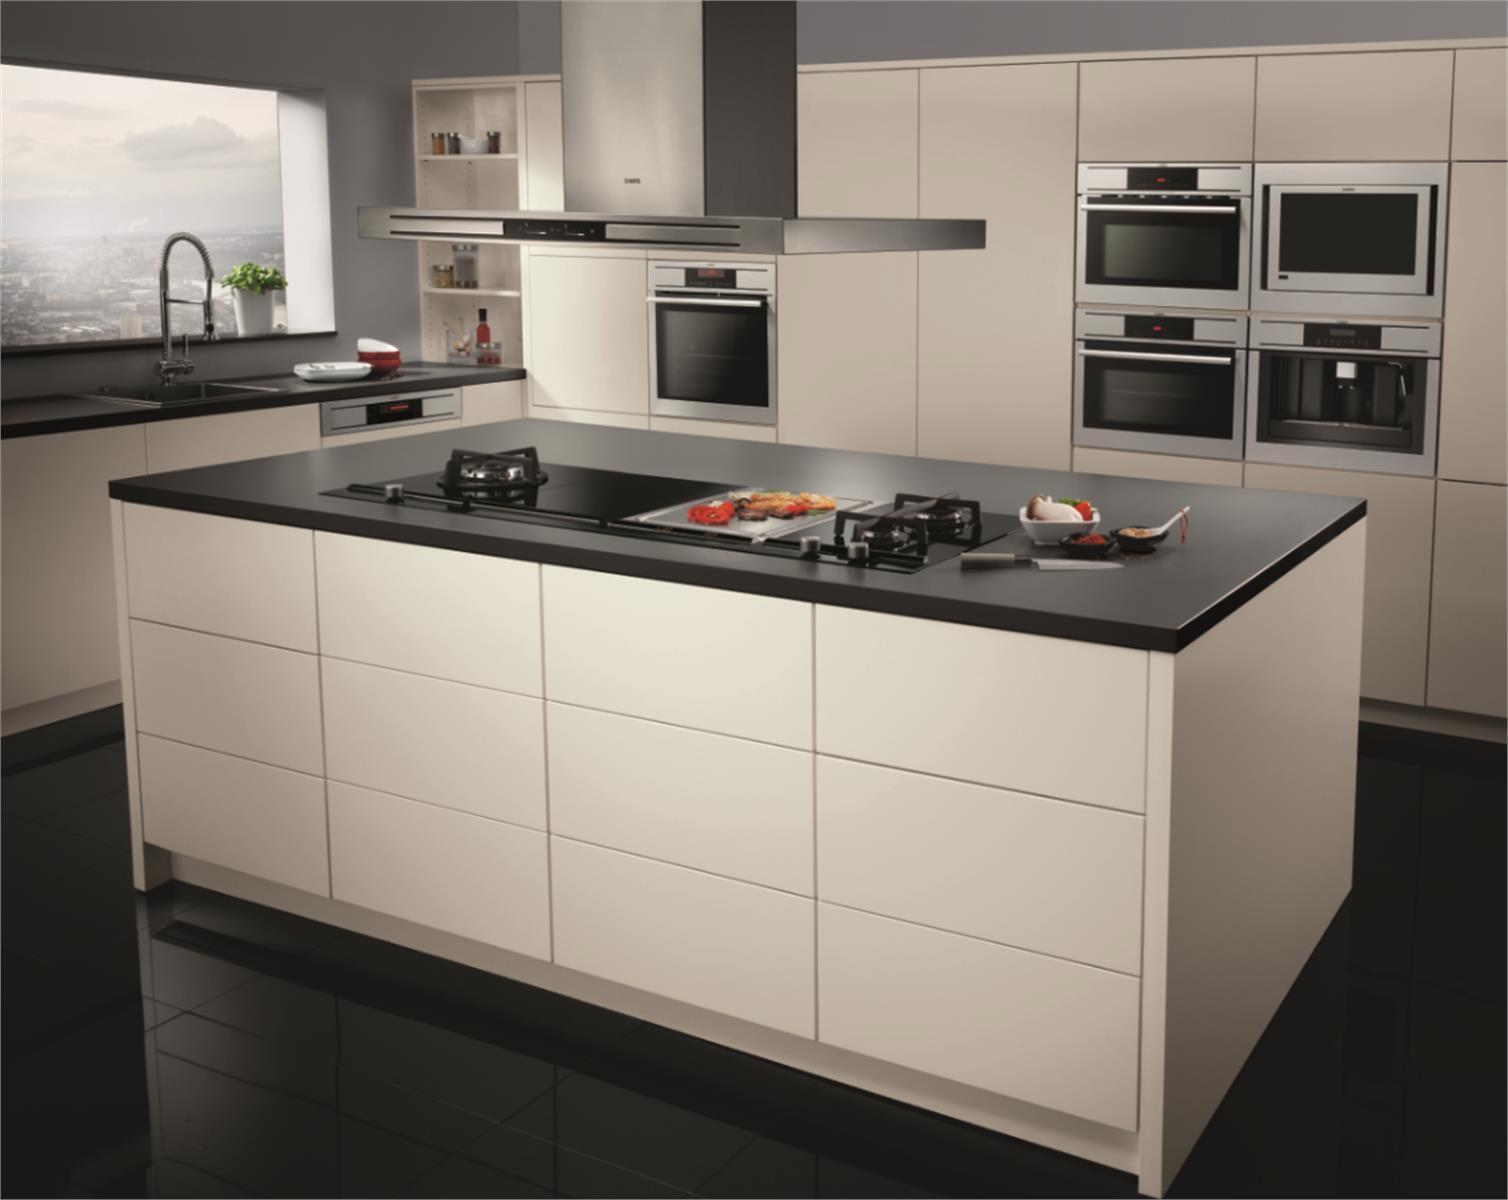 conforama placard dressing cuisine quip e editus. Black Bedroom Furniture Sets. Home Design Ideas